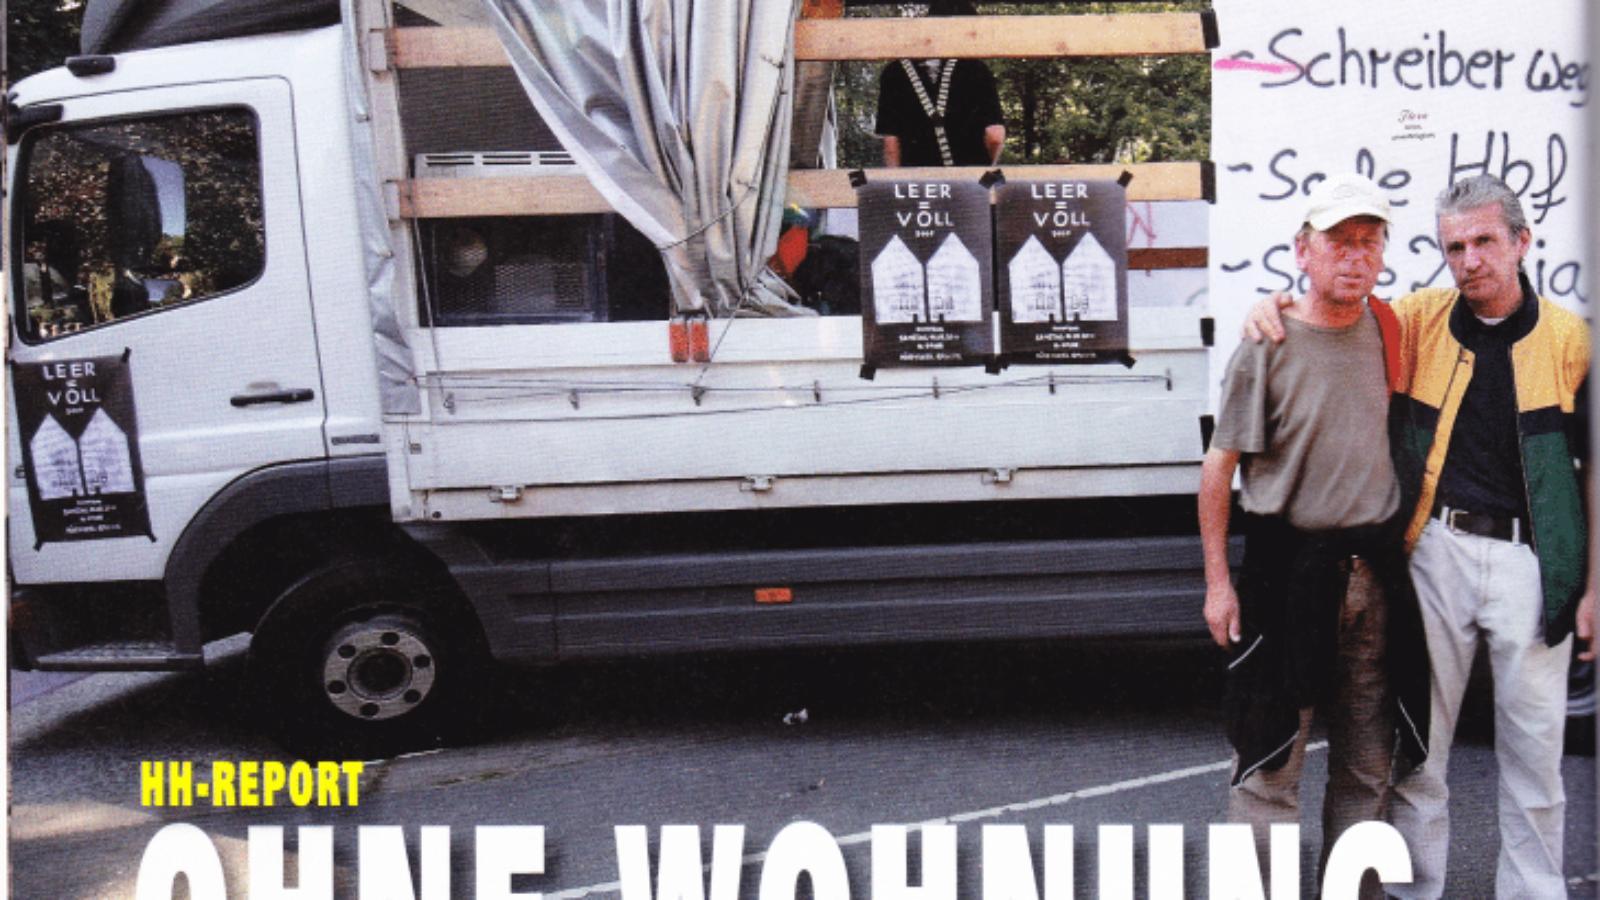 HH-Report – Ohne Wohnung